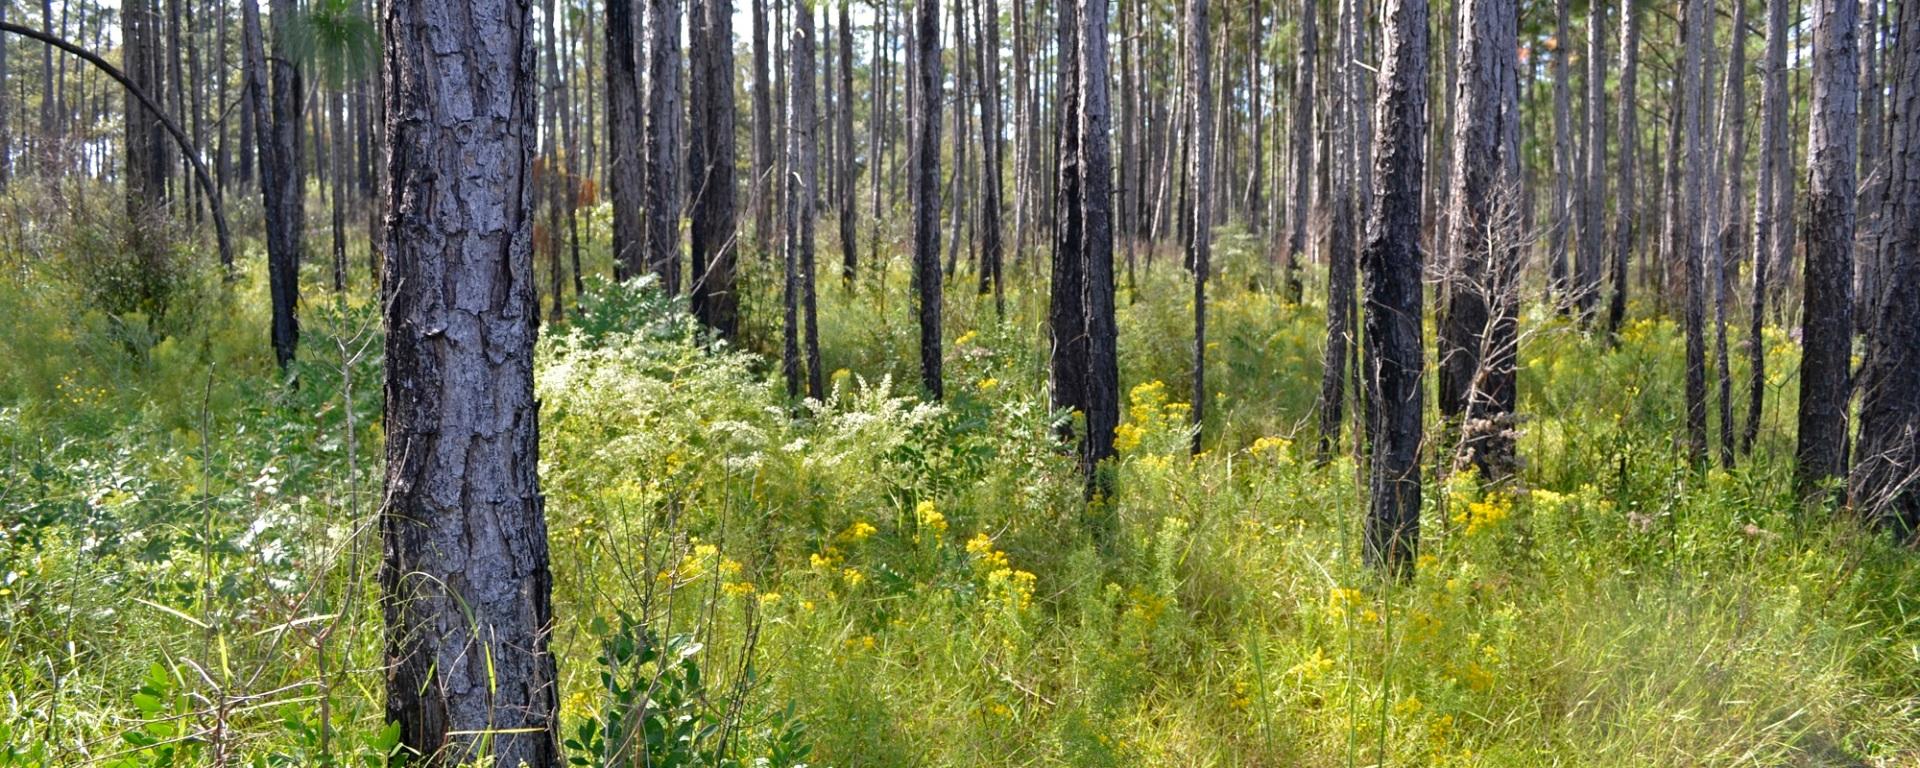 karick lake, florida, wildflowers, fall fores, travel